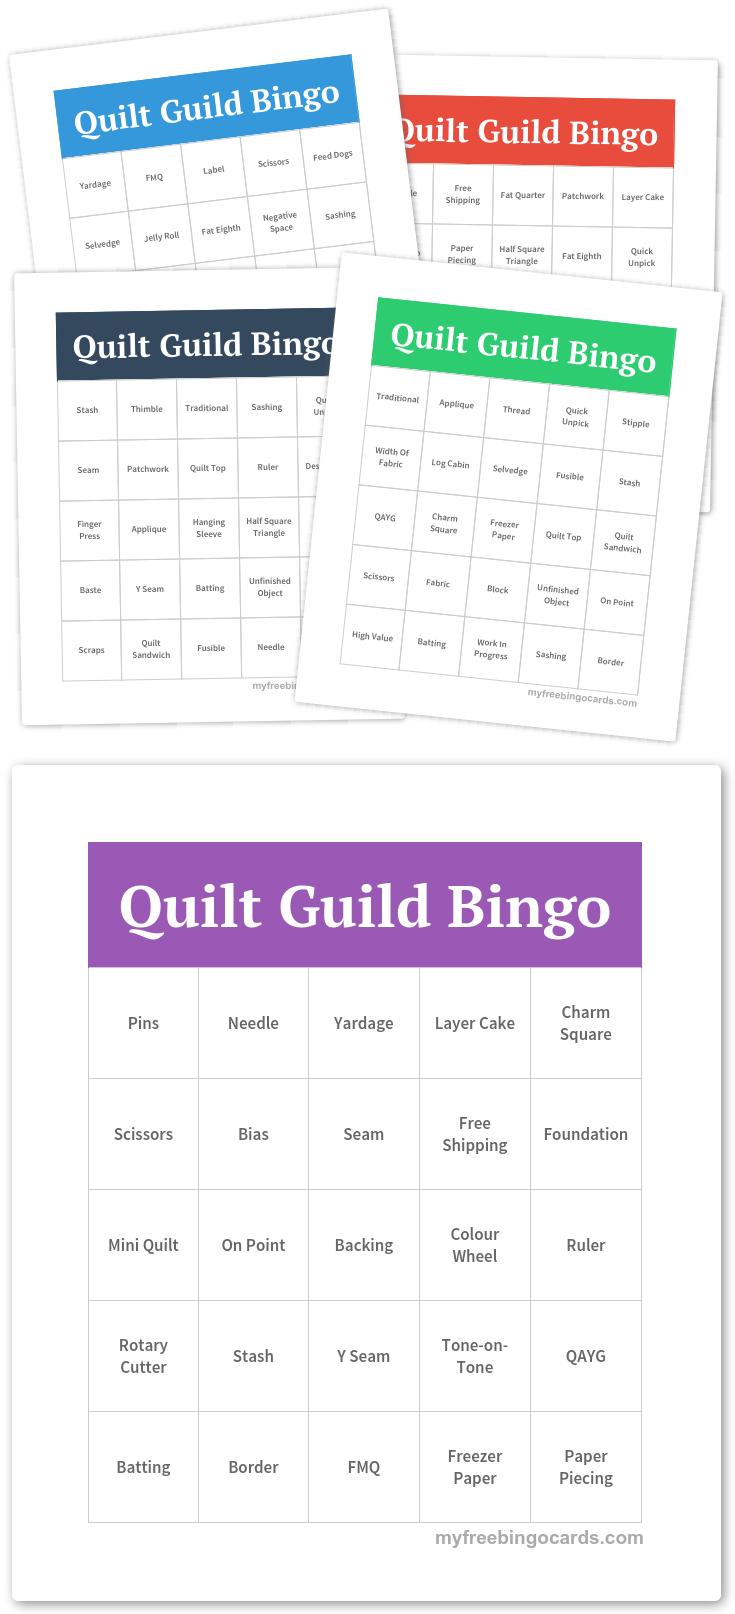 Free Printable Bingo Cards | Bingo Quilt Games | Free Bingo Cards - Free Printable Parts Of Speech Bingo